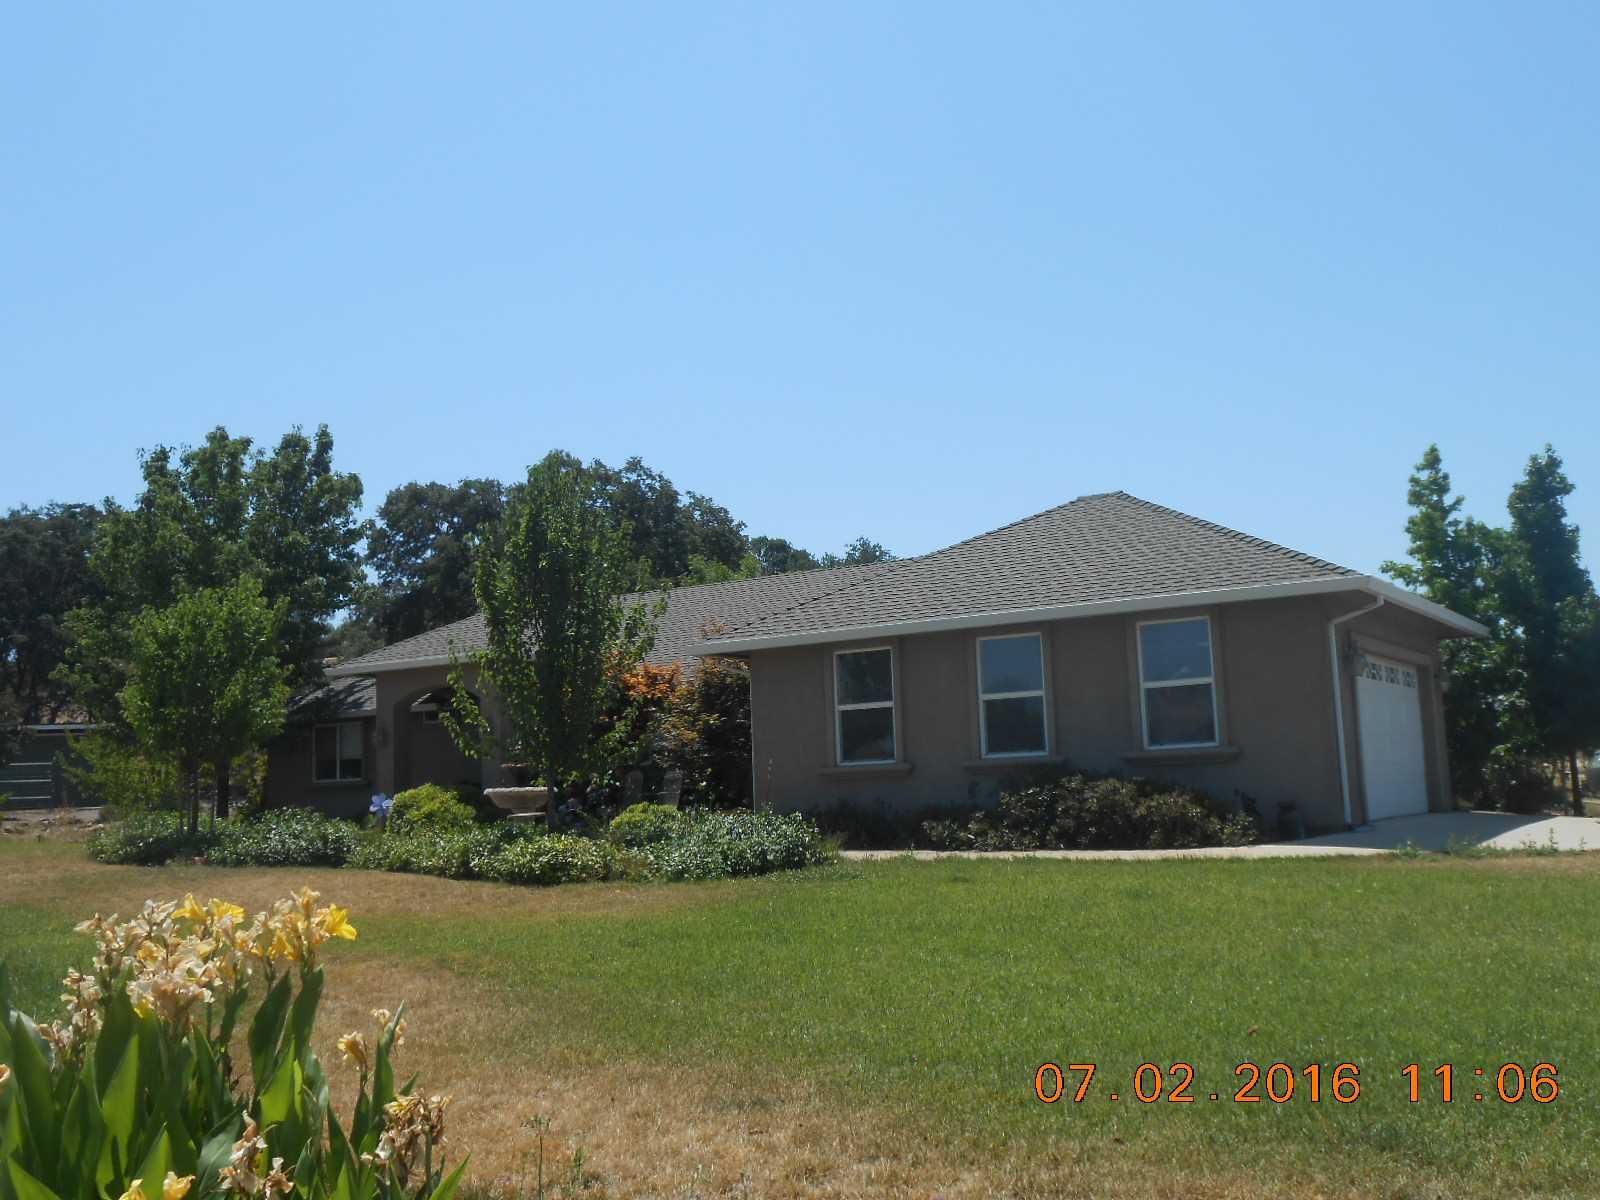 2044 S Ranchero Rd, Valley Springs, CA 95252